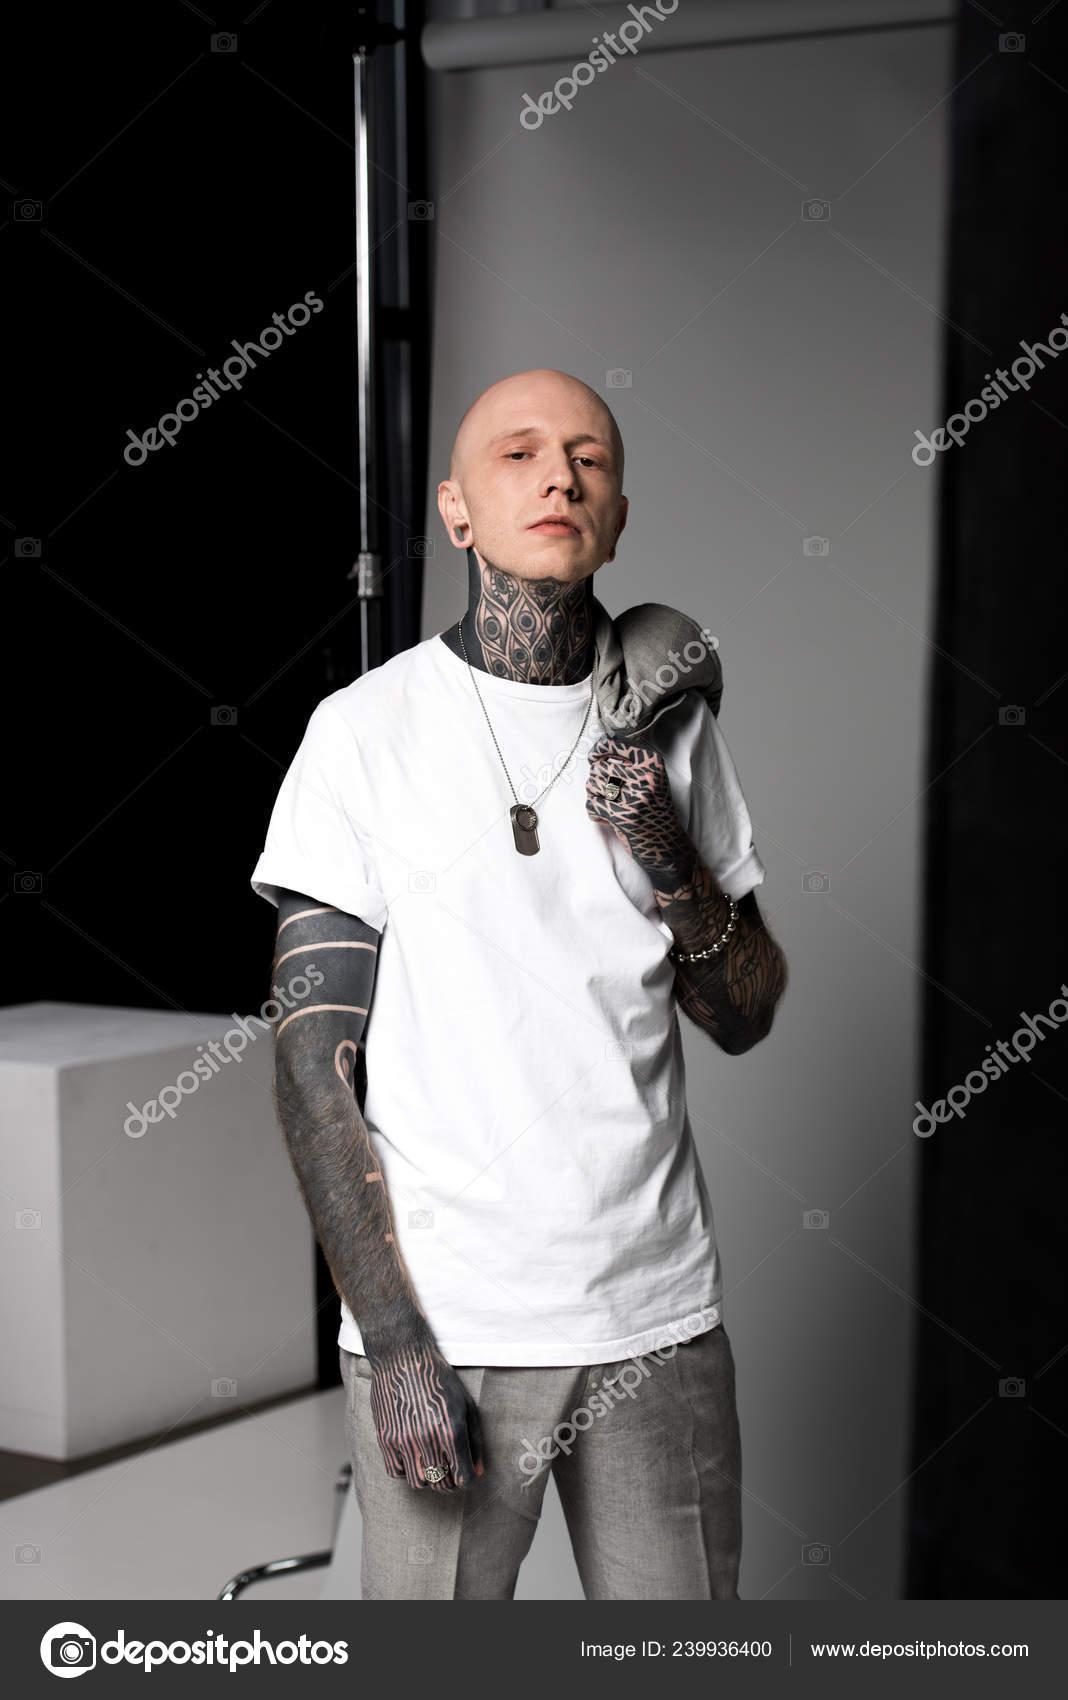 Men with tattoos bald 17 Head